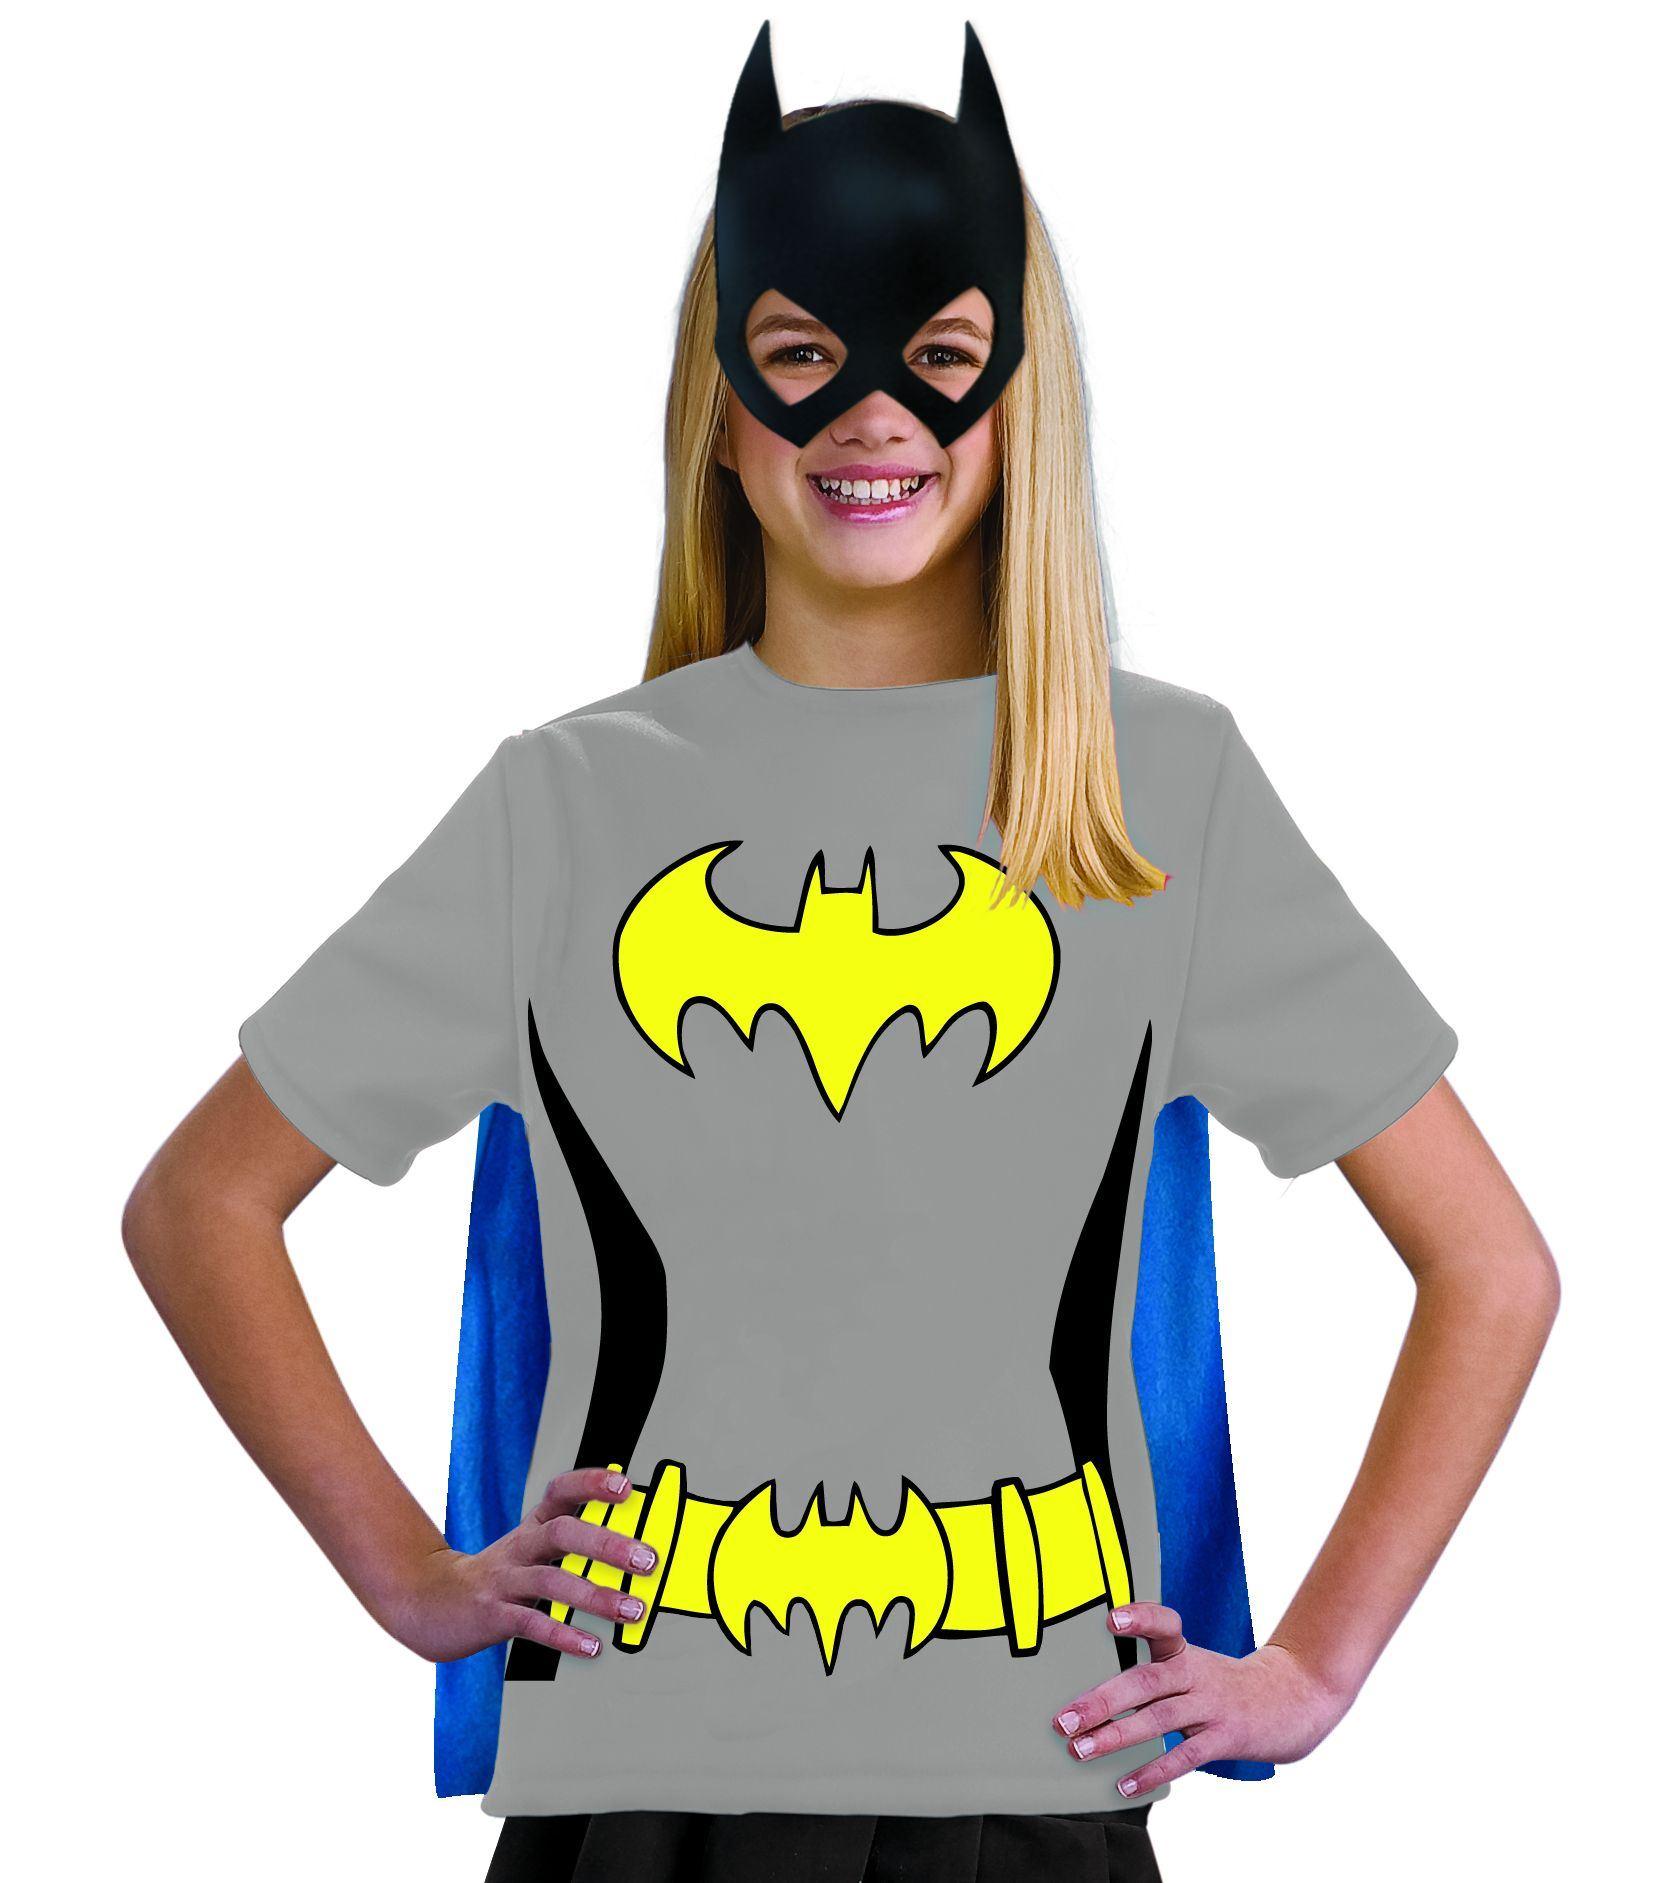 Kids Batgirl Tween Girl Shirt Costume  sc 1 st  The Costume Land & Kids Batgirl Tween Girl Shirt Costume | $28.99 | The Costume Land